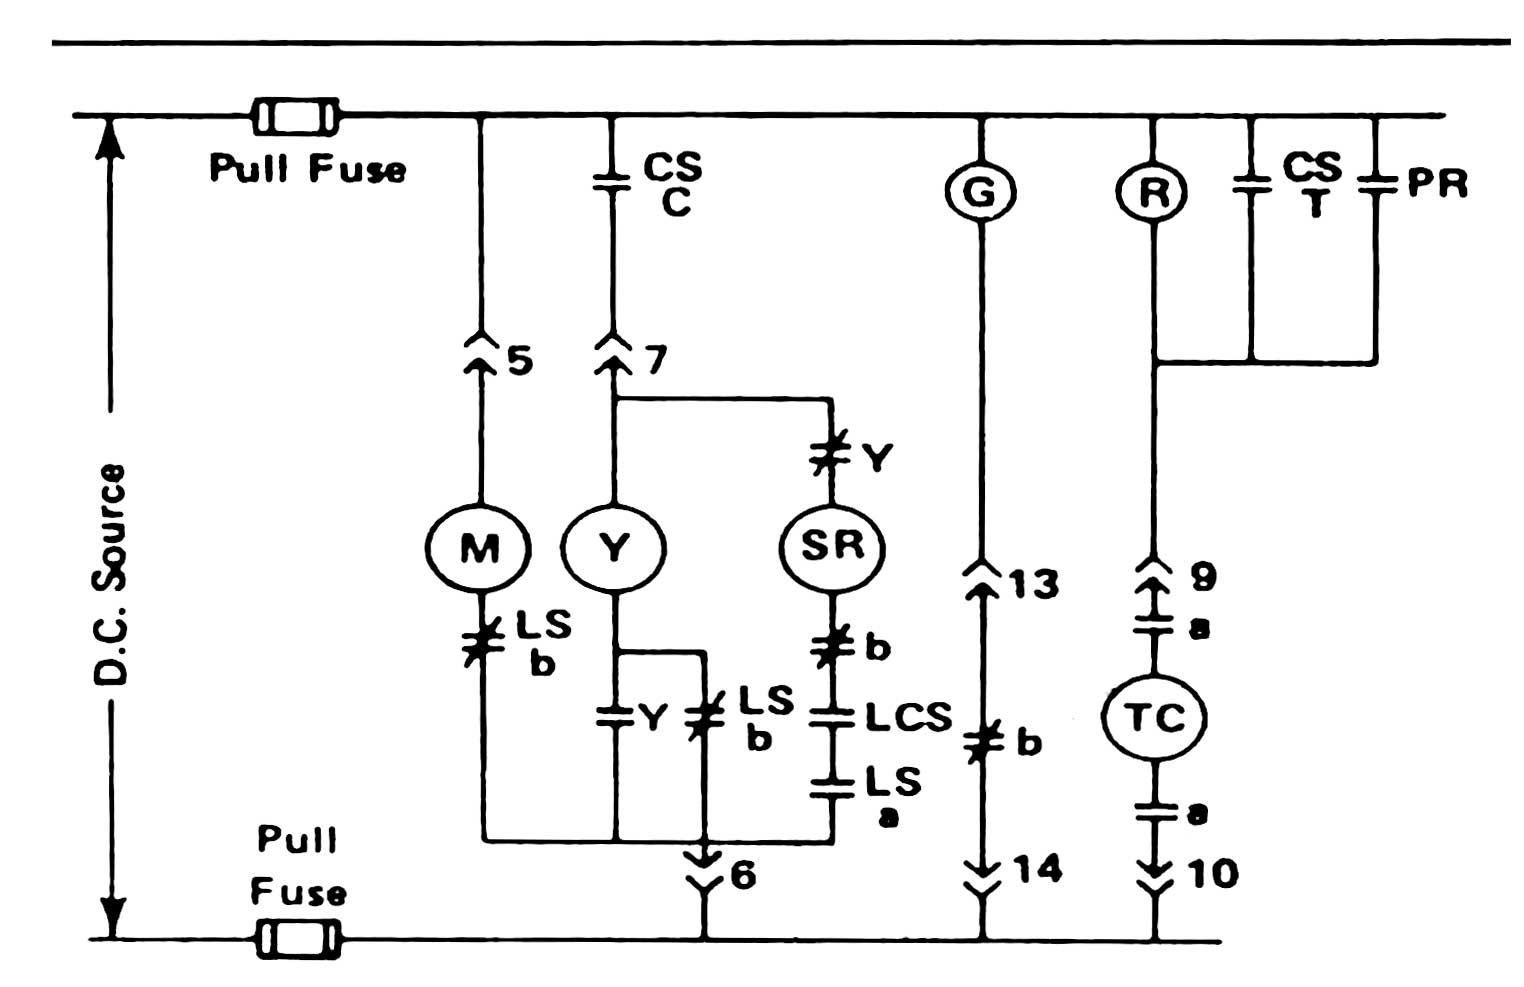 Circuit Breaker Control Schematic Explained Circuit Breakers Control